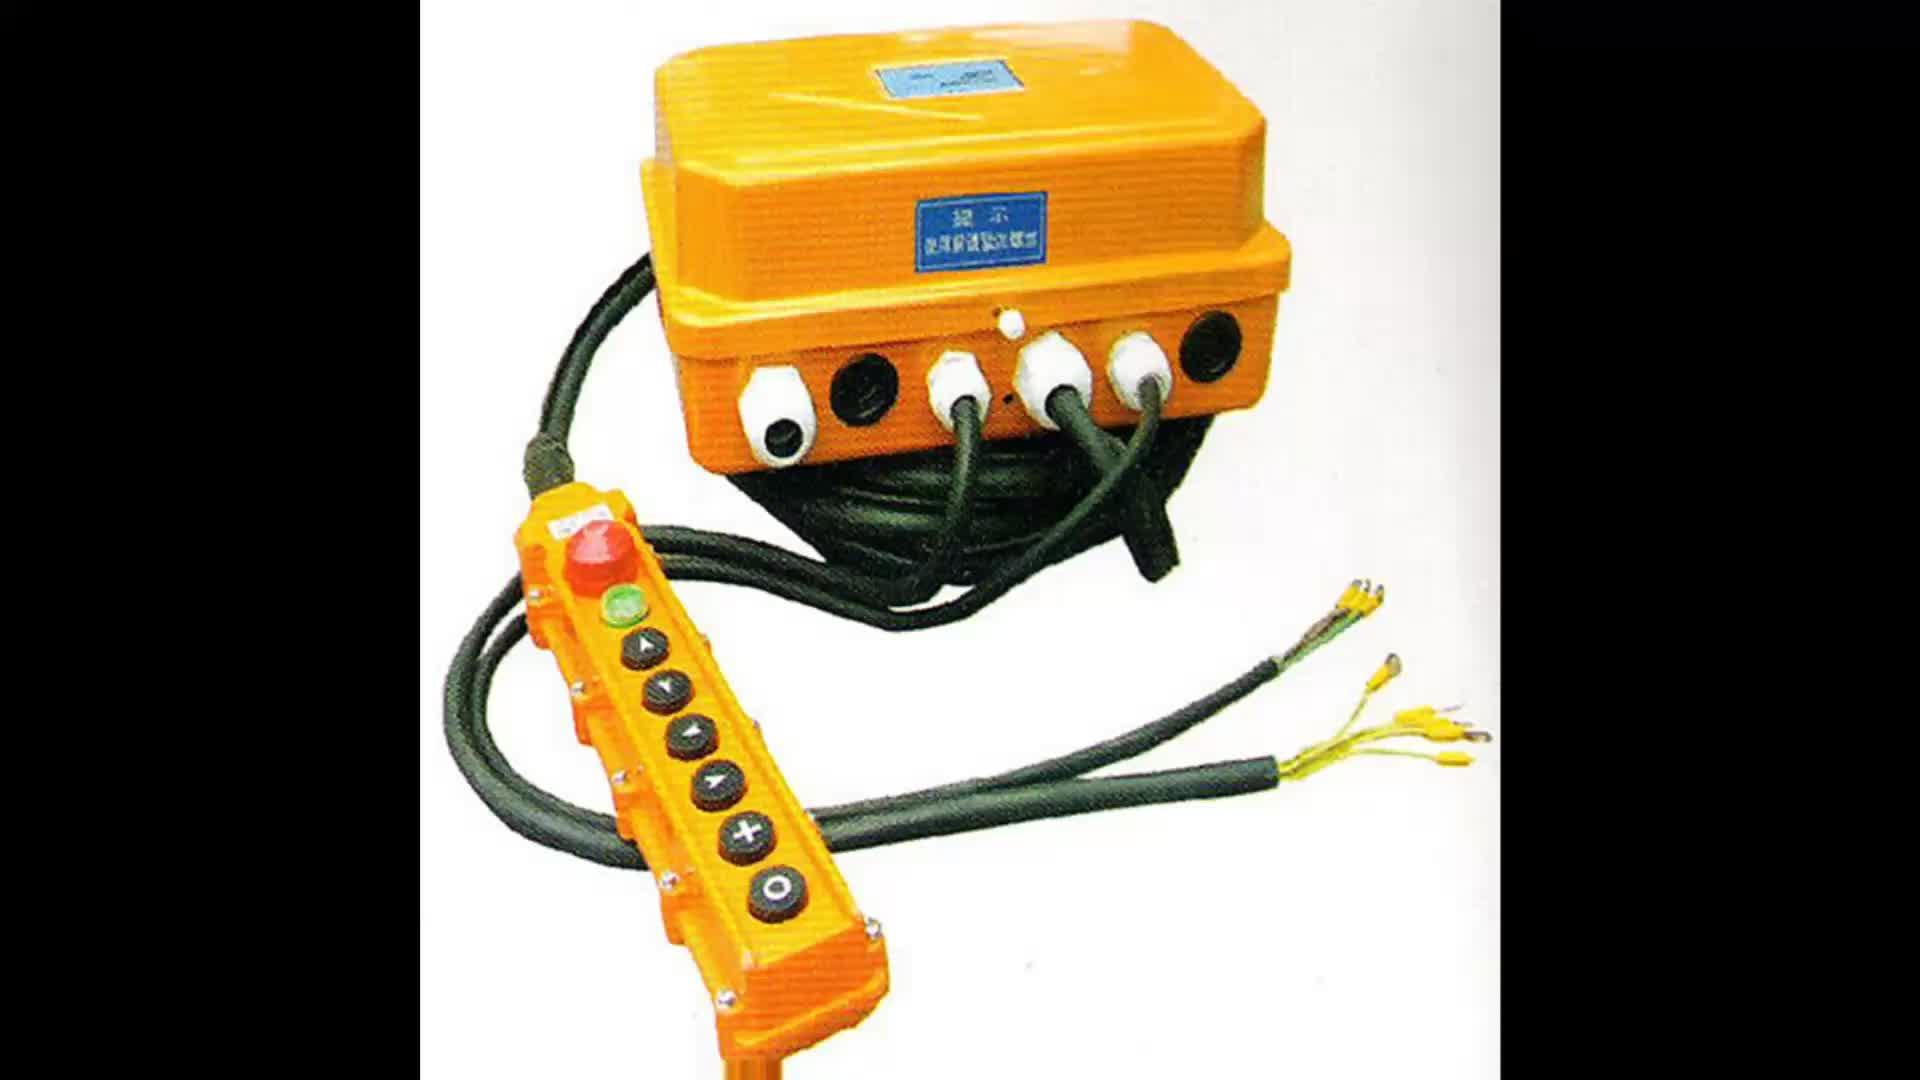 Nucleon Brand Wireless Radio Crane Remote Control